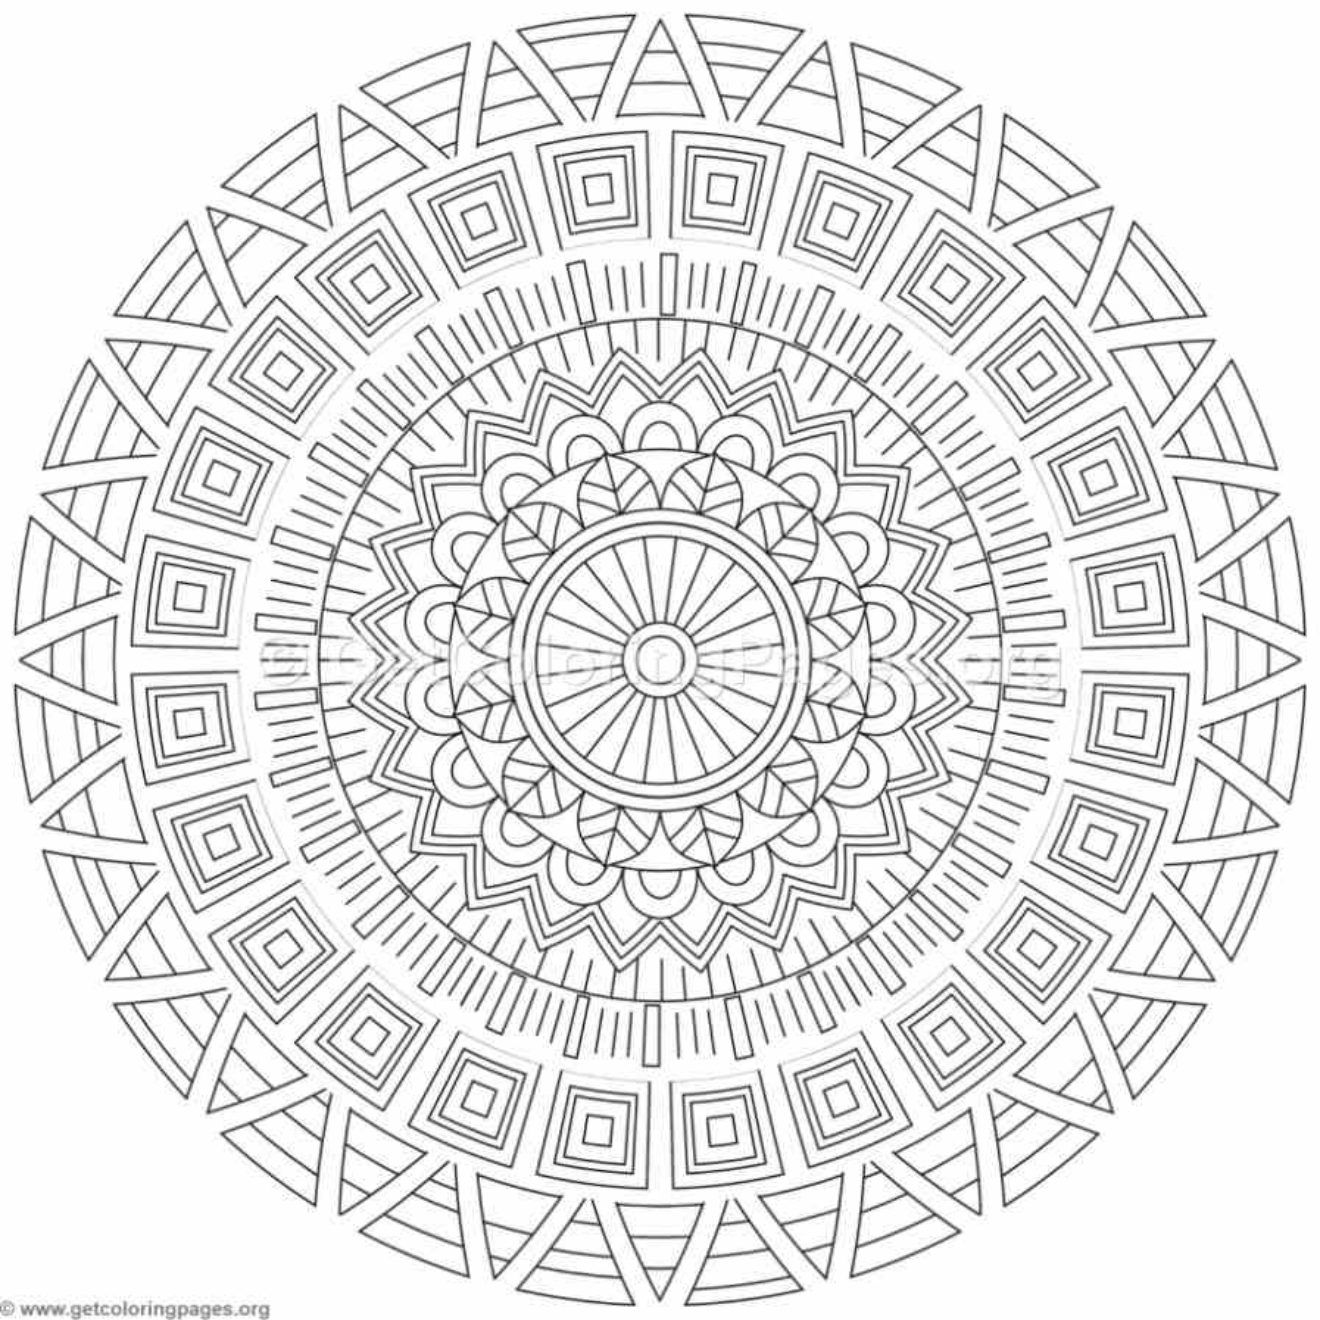 Tribal Mandala Coloring Pages #132   To Color - Mandalas   Pinterest ...